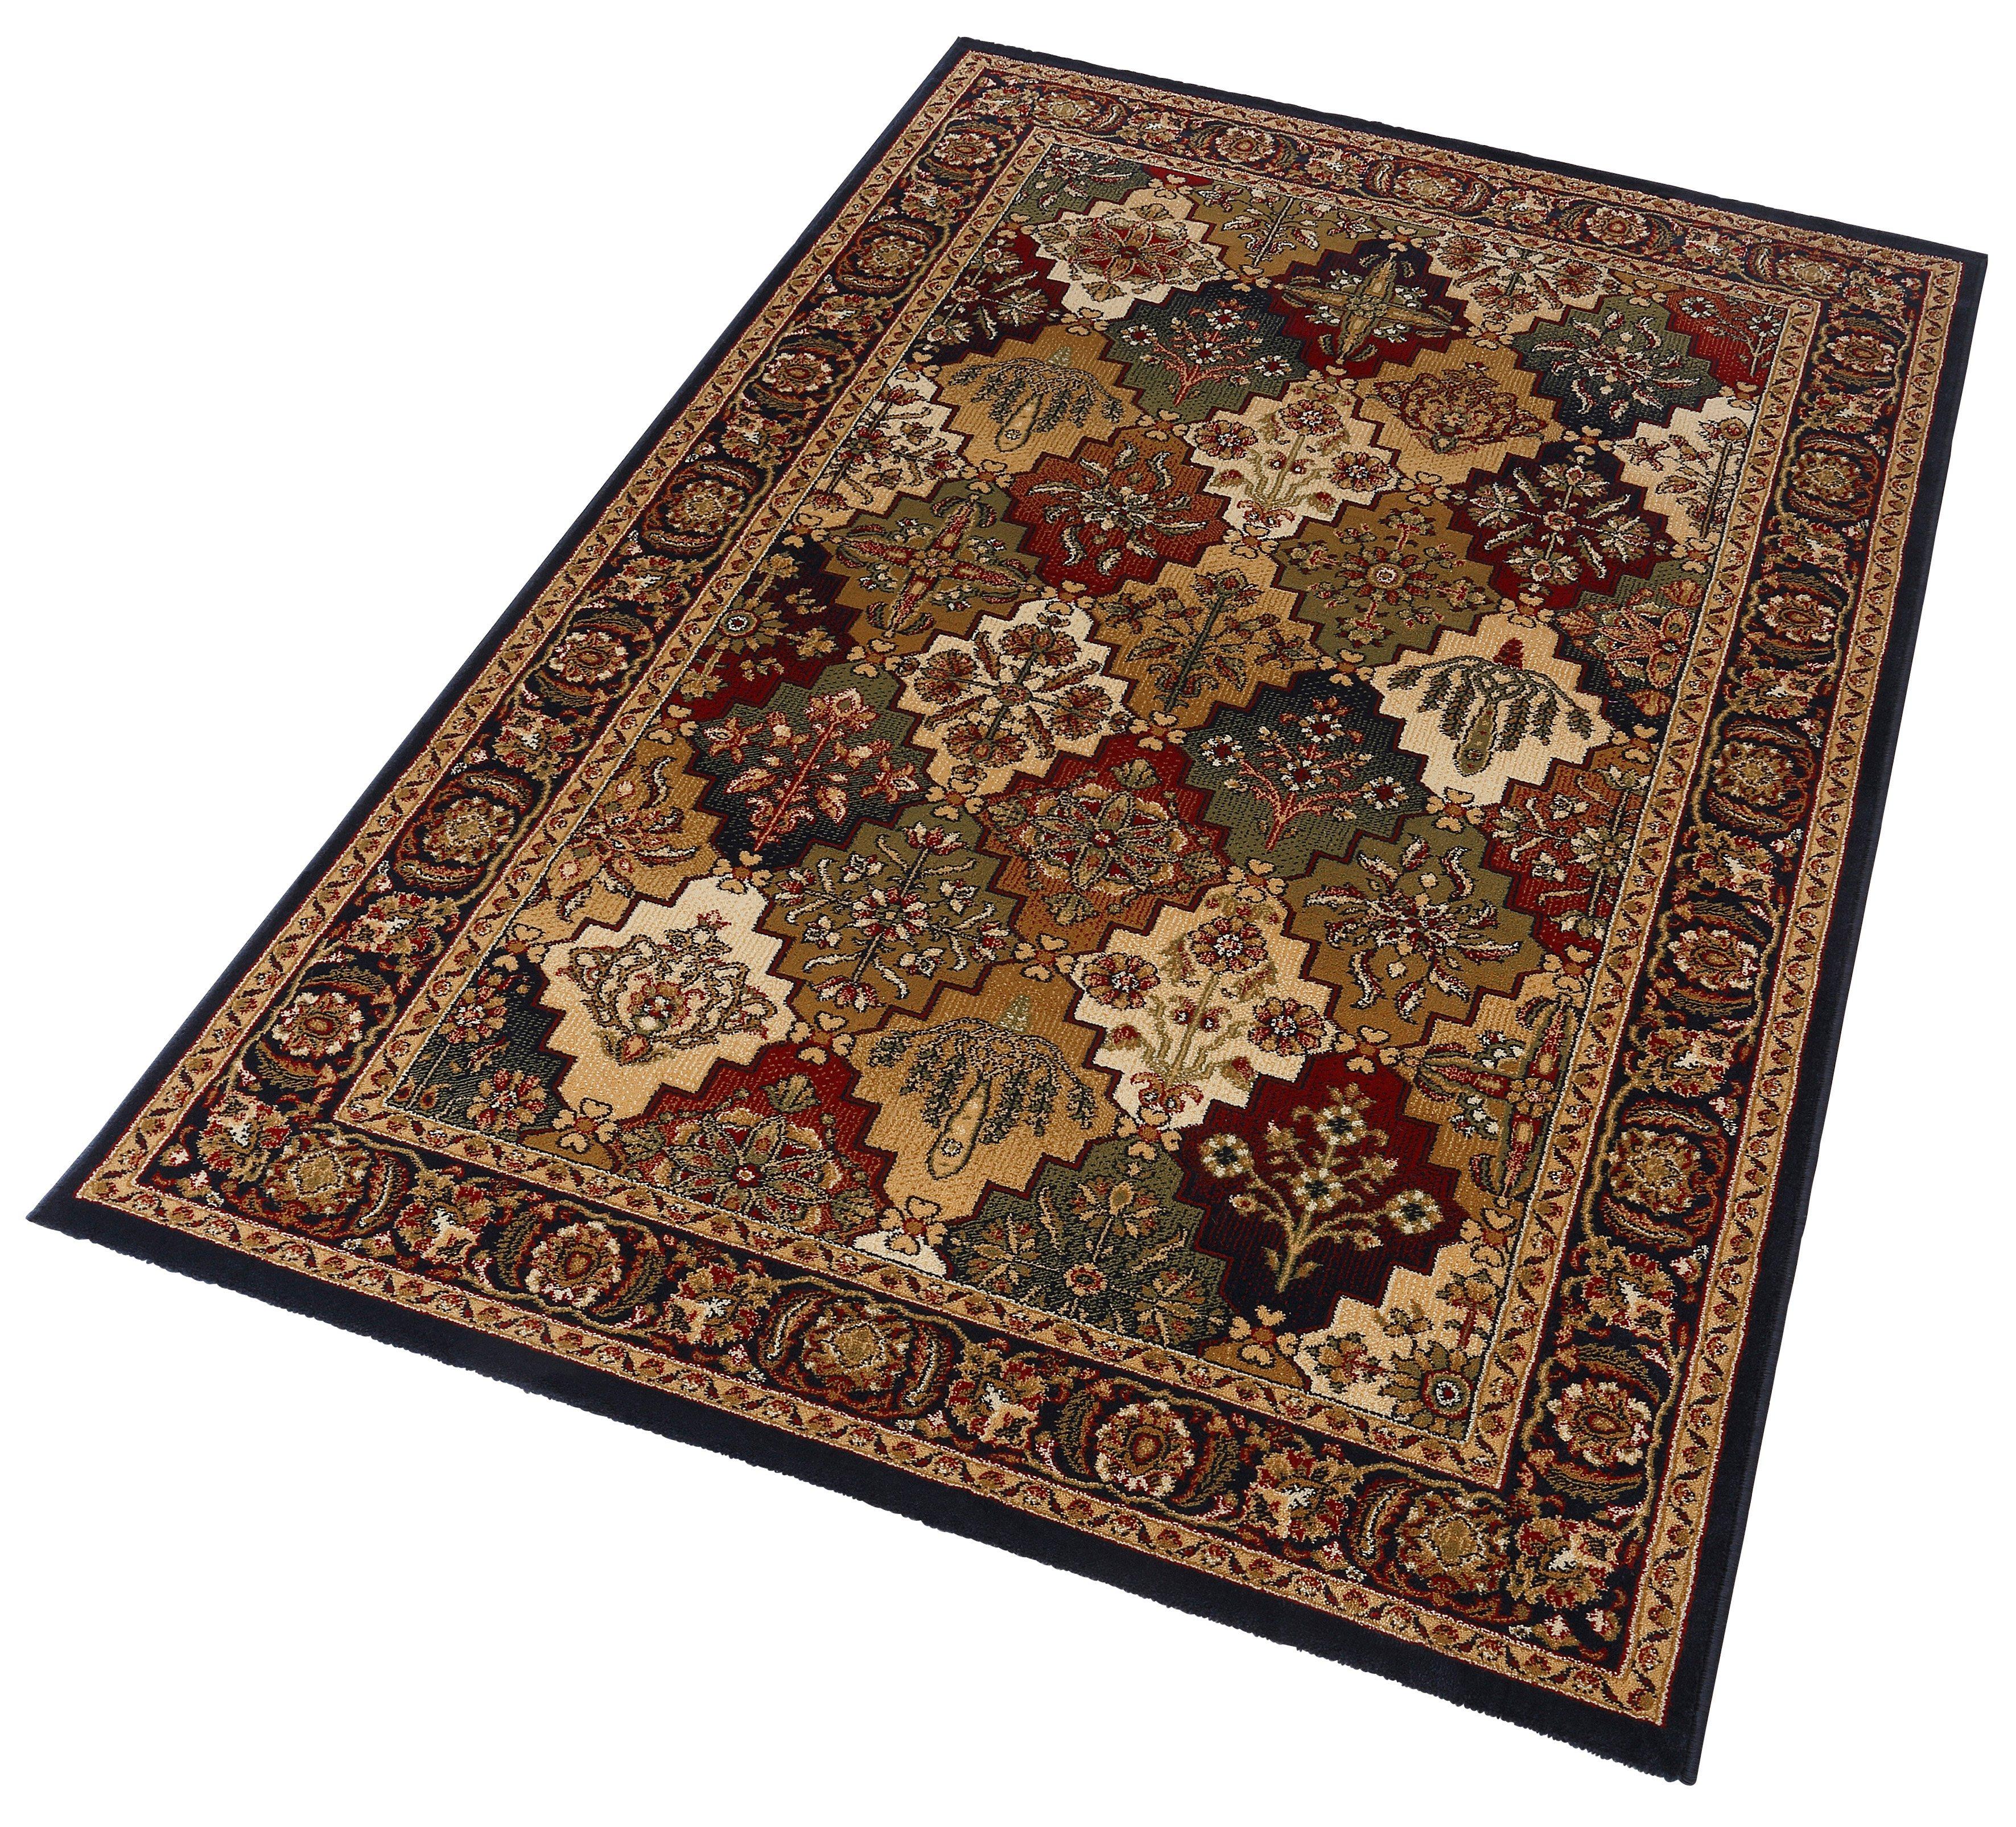 Orientteppich »Noemi«, Oriental Weavers, rechteckig, Höhe 8 mm | Heimtextilien > Teppiche > Orientteppiche | Oriental Weavers